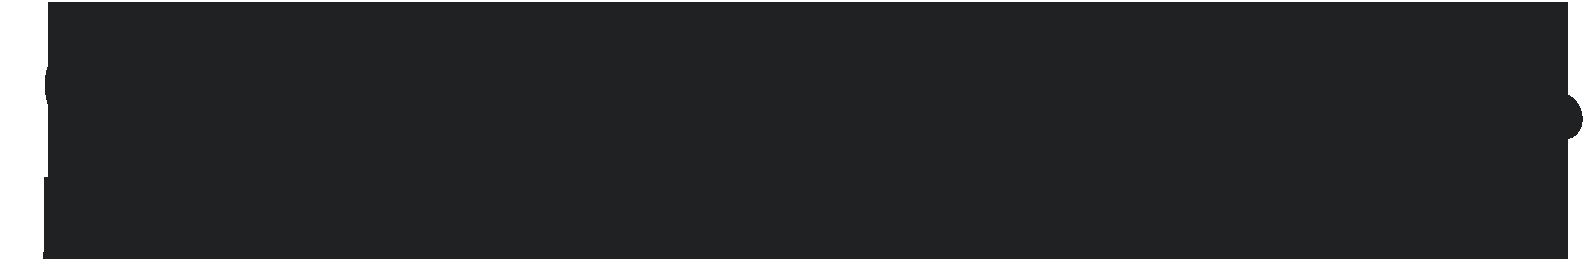 Hotels Restaurant and Lifestyle Reviewed : SOtraveler.COM